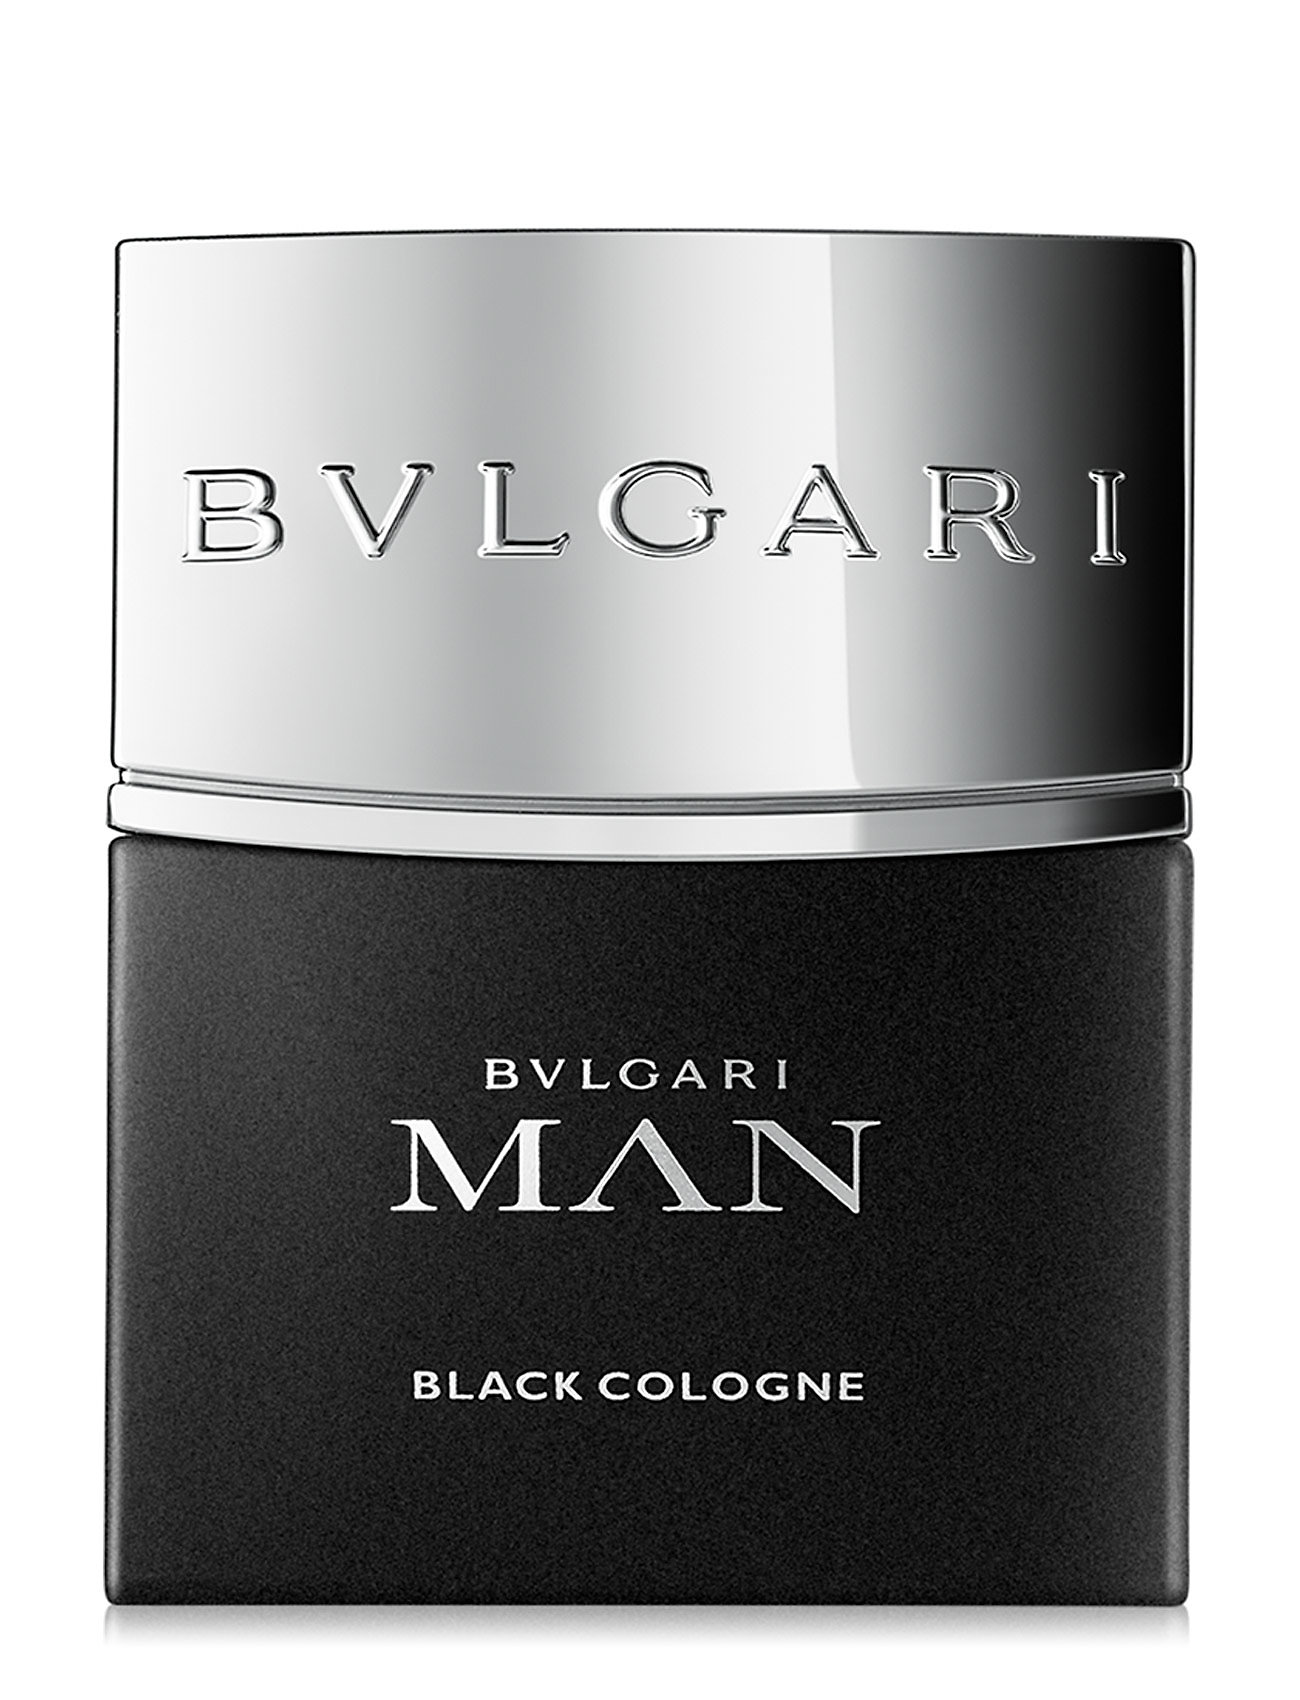 Man Black Cologne Edt 30ml BVLGARI #I/T til Mænd i